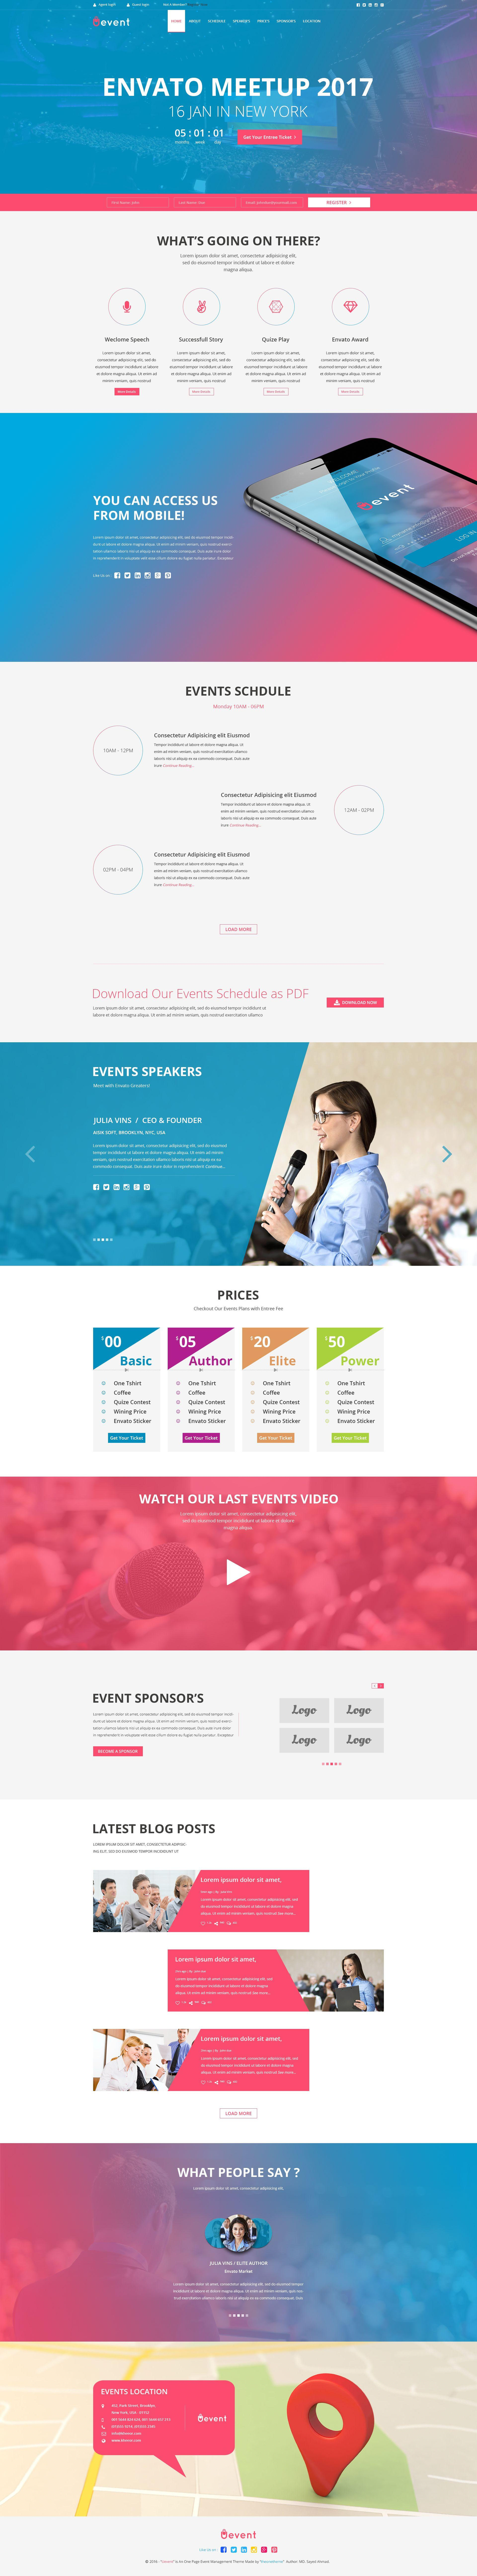 Uevent - One page Event Management PSD Template   Event management ...